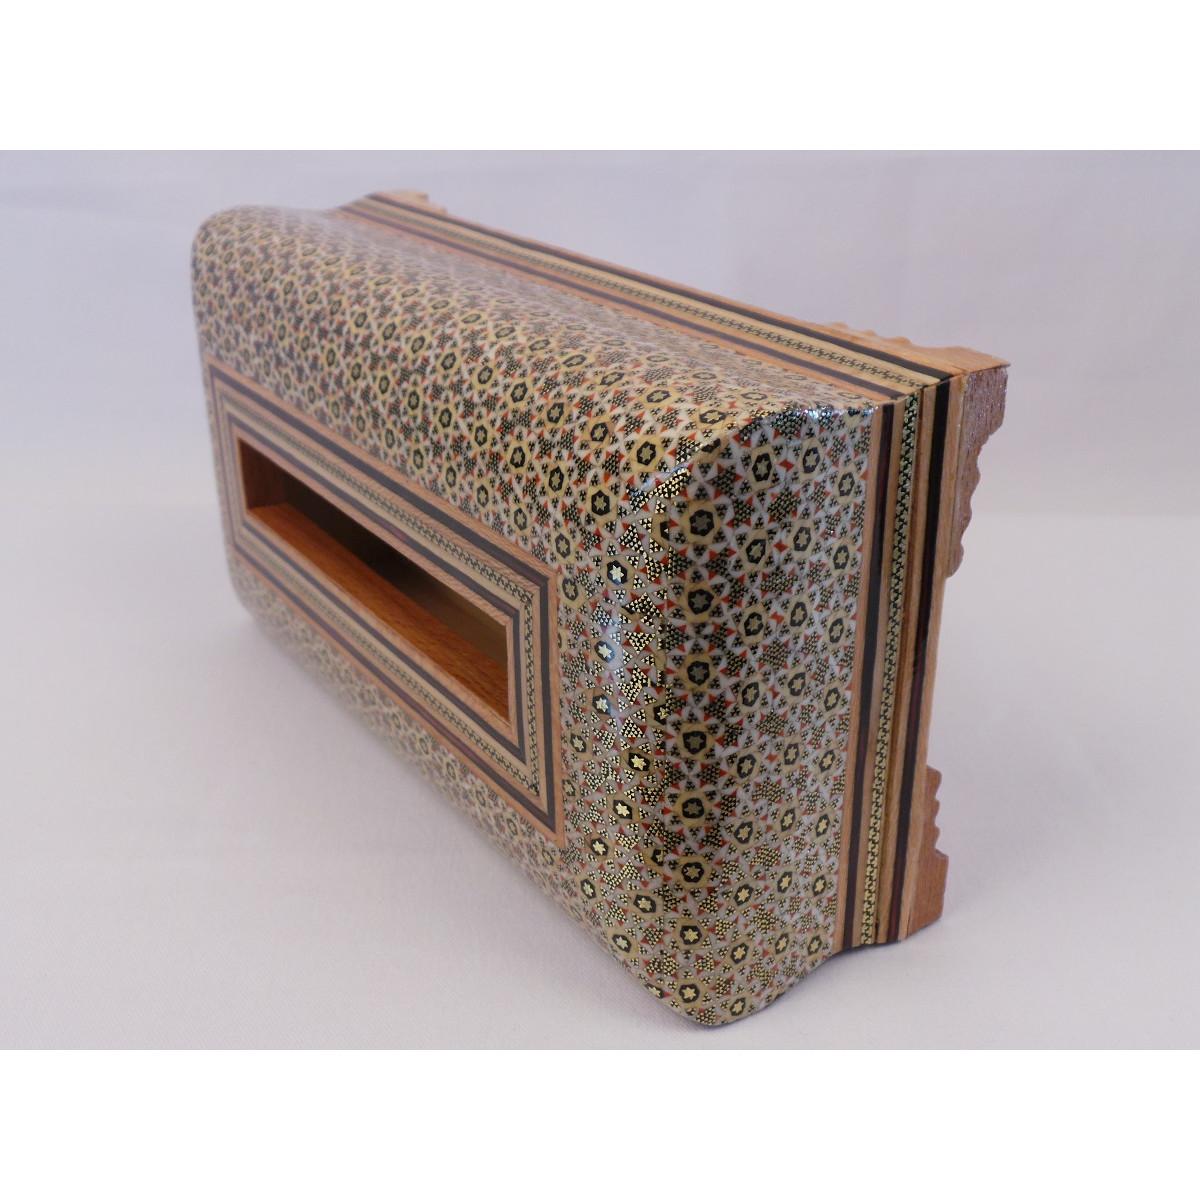 Khatam on Wood Tissue Box - HKH3013-Persian Handicrafts